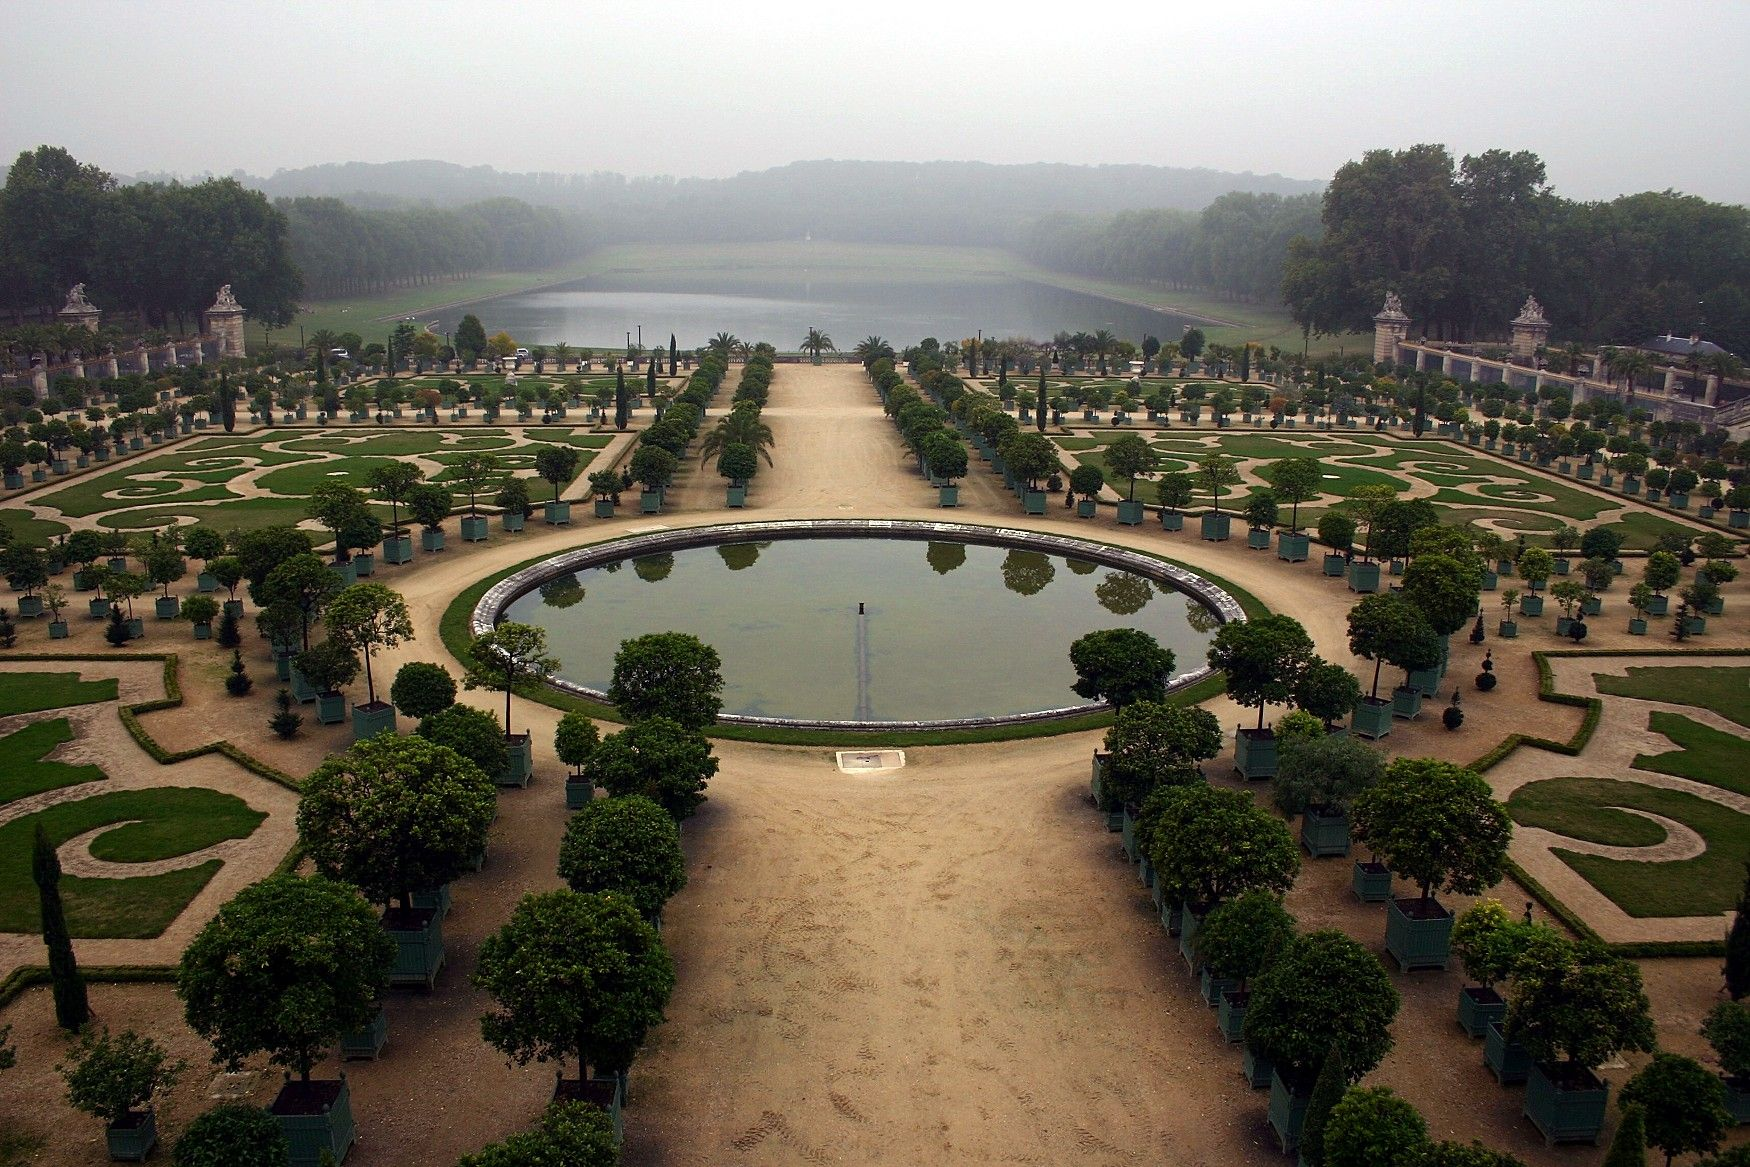 Pin by Pokryte patyną on France | Pinterest | Gardens, Versailles ...